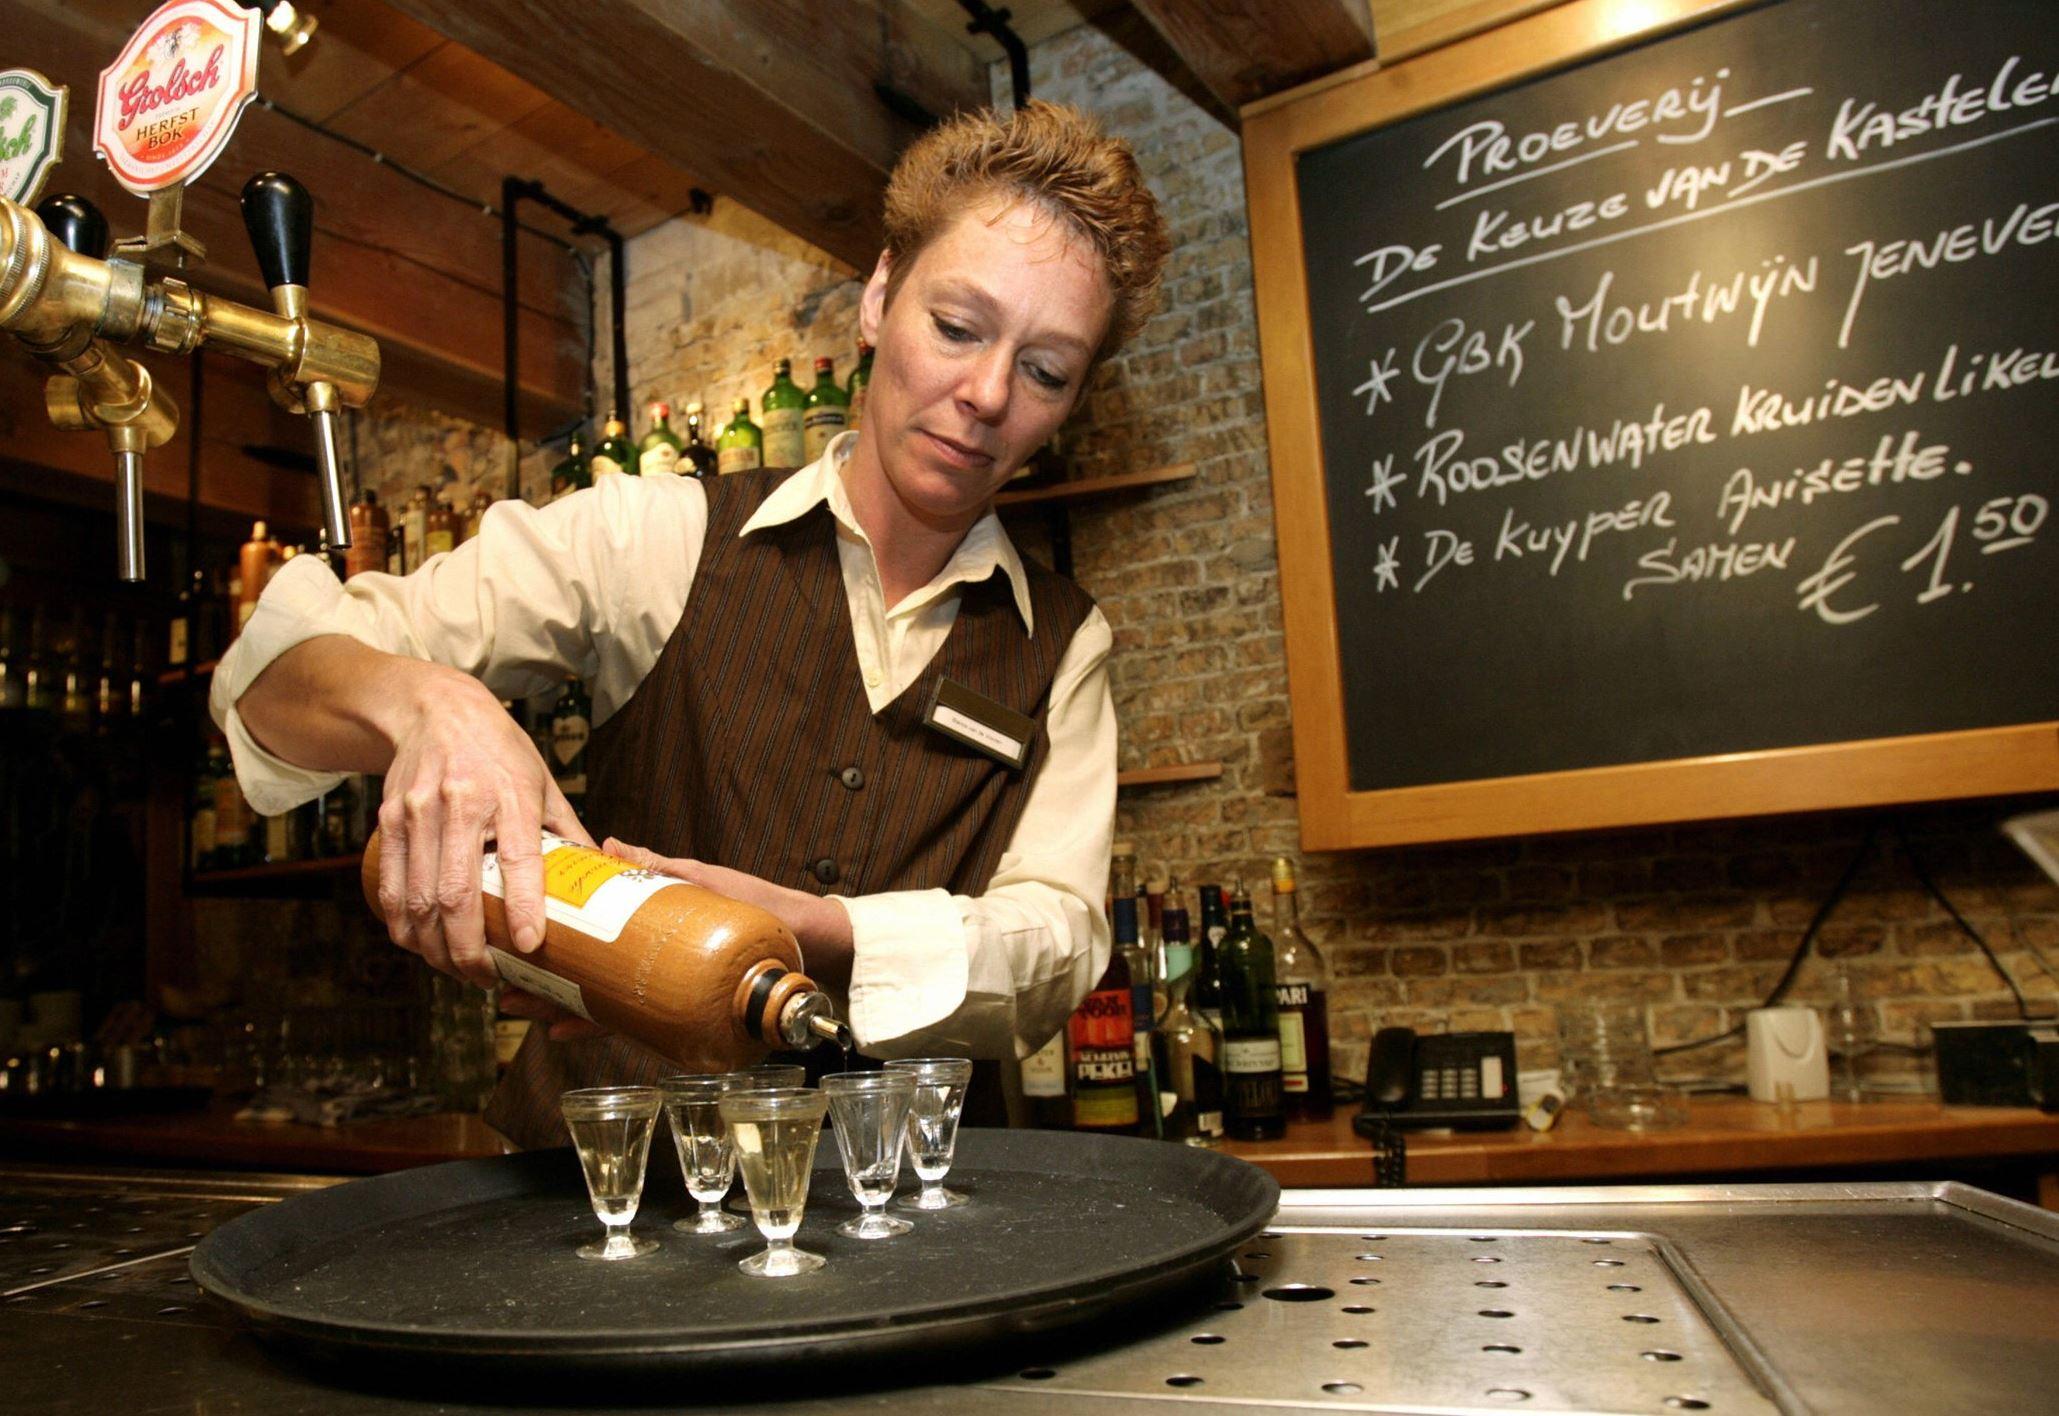 20140329gettygeneverfood01 Hostess Bianca van de Vooren pours jenever into traditional jenever taste glasses in the bar of the Jenever Museum in Schiedam, the Netherlands.